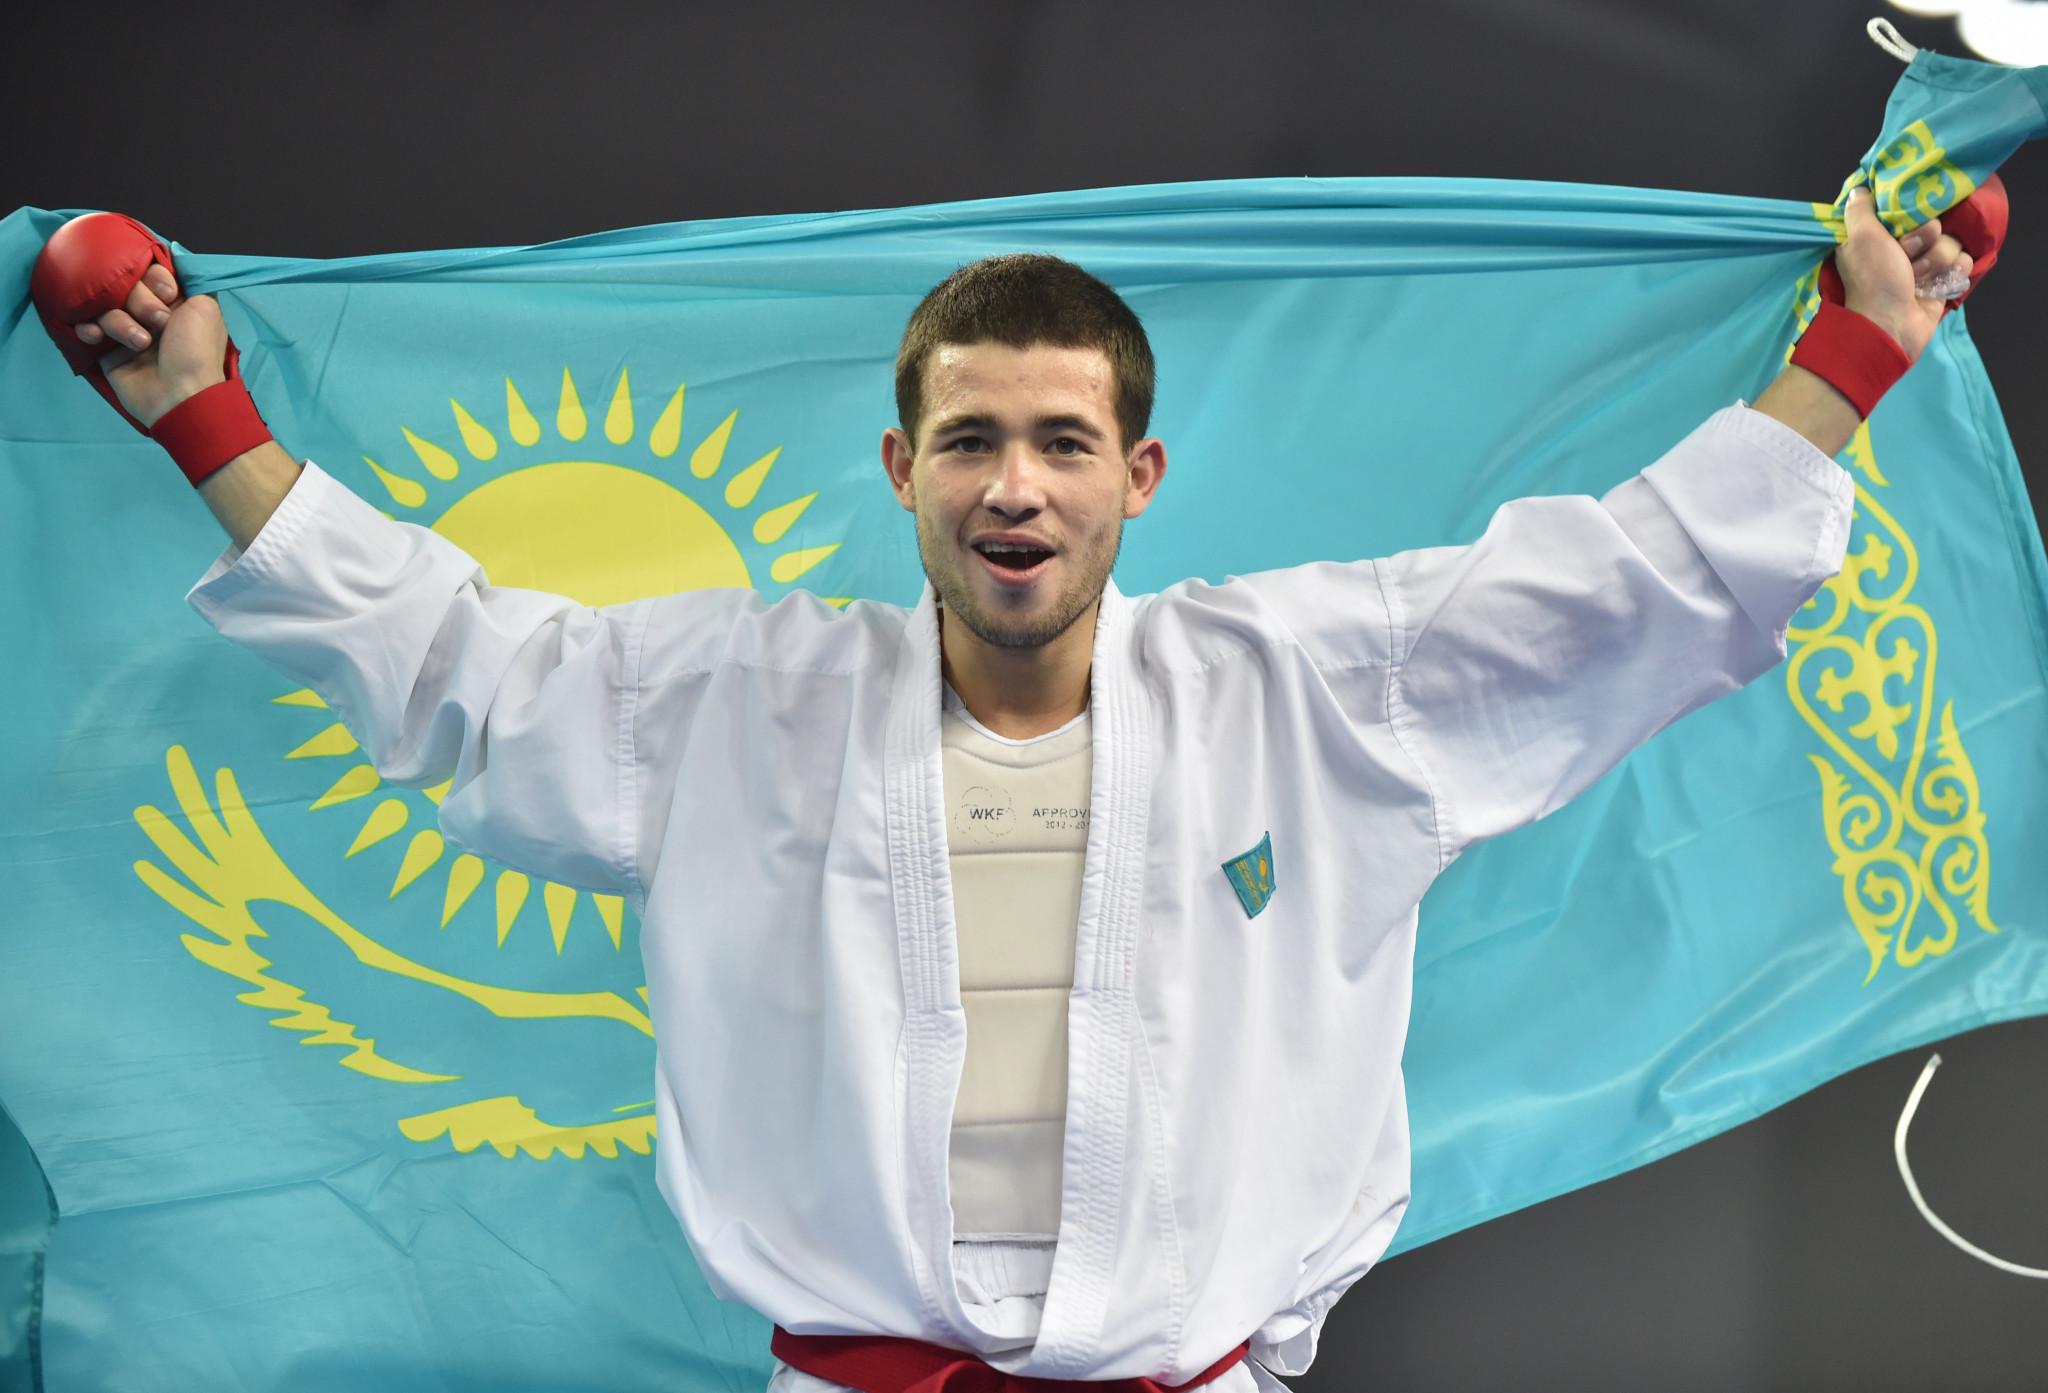 Kazakhstan's Andrey Aktauov won the men's under-55kg kumite gold medal at the 2019 Asian Championships ©Getty Images